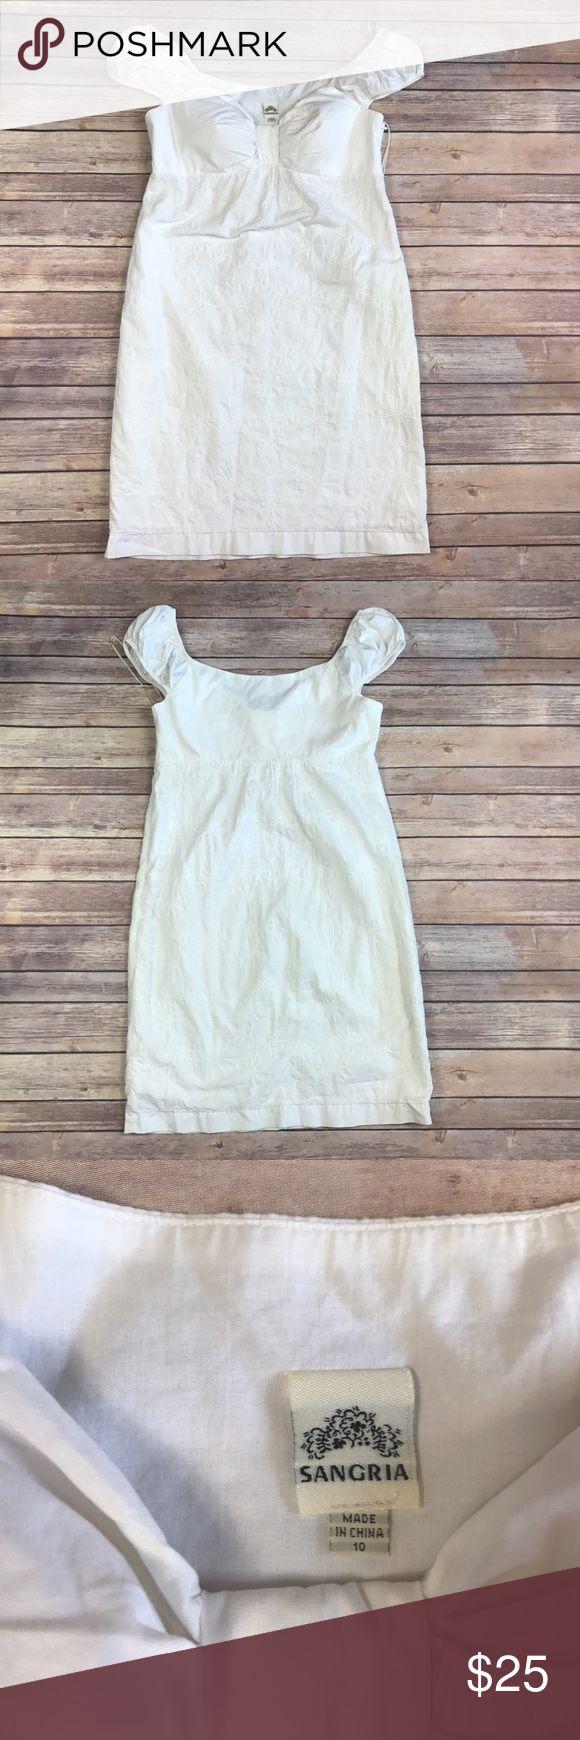 "Sangria white floral off the shoulder dress Sangria women's size 10 white floral off the shoulder dress smoke free home.   armpit to armpit 18"" length 31"" waist 19""   e Signature by Sangria Dresses Mini"